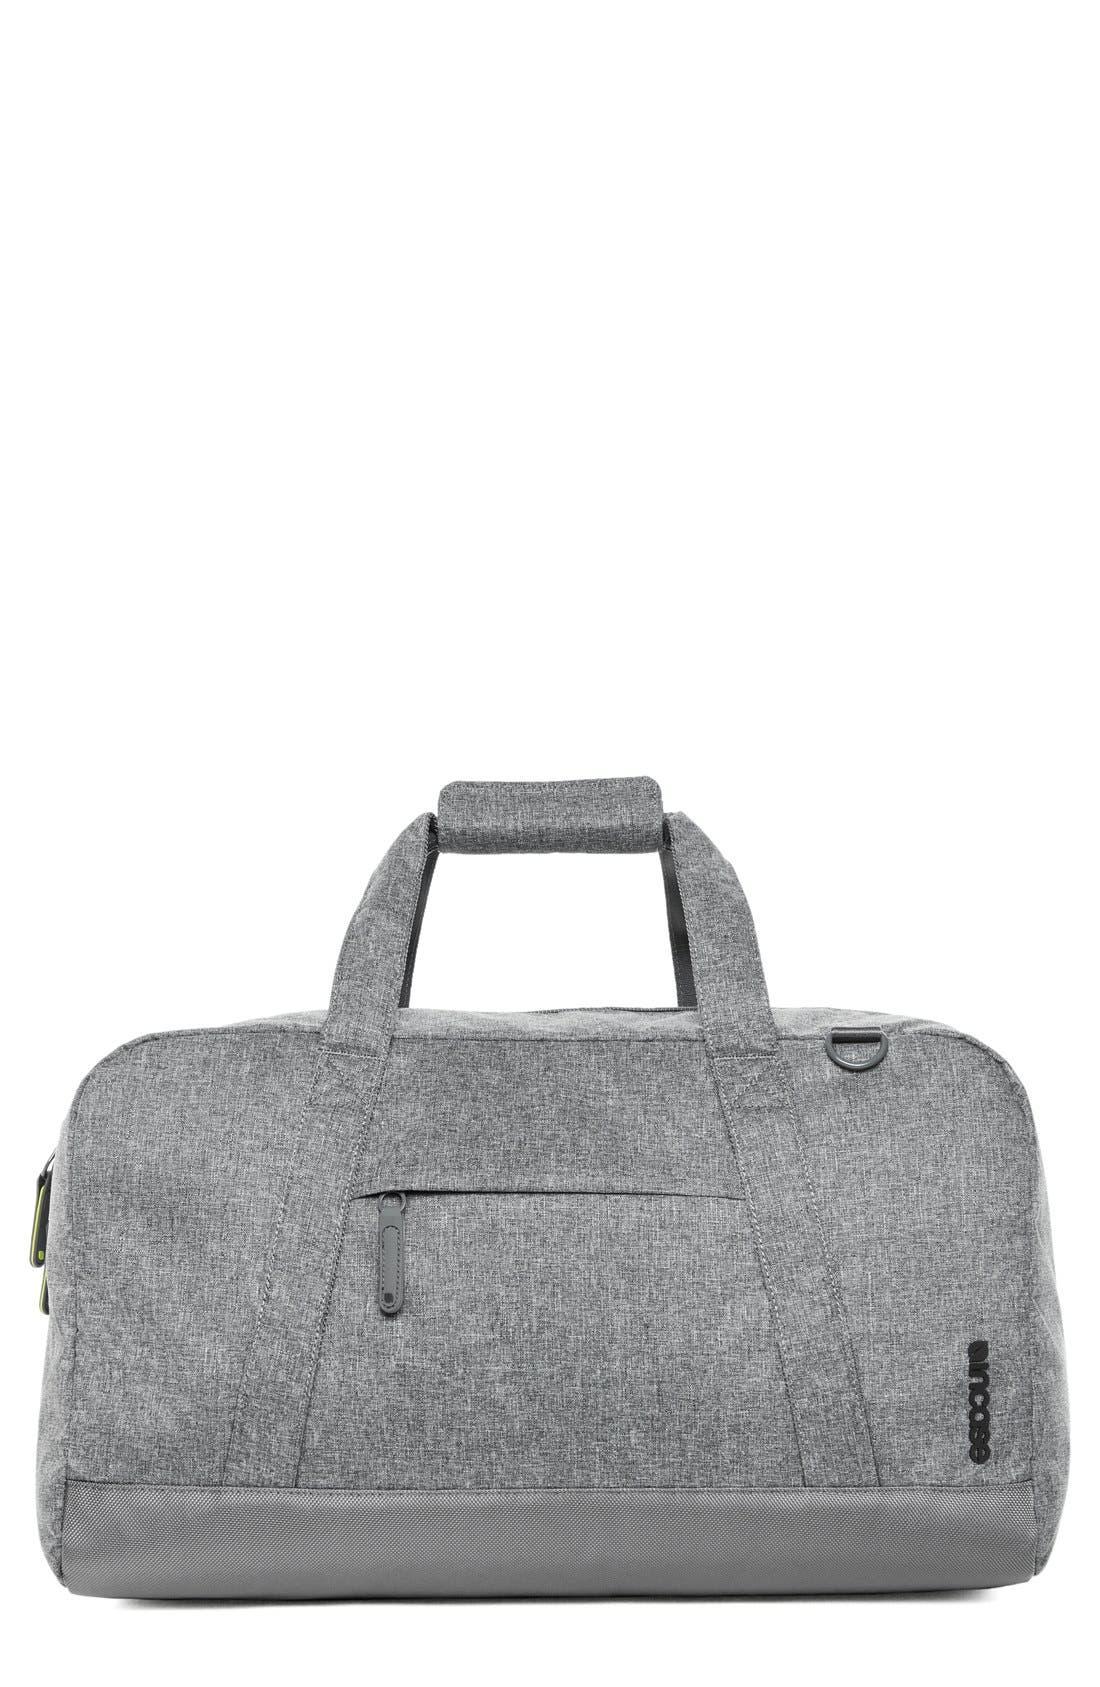 EO Duffel Bag,                             Main thumbnail 2, color,